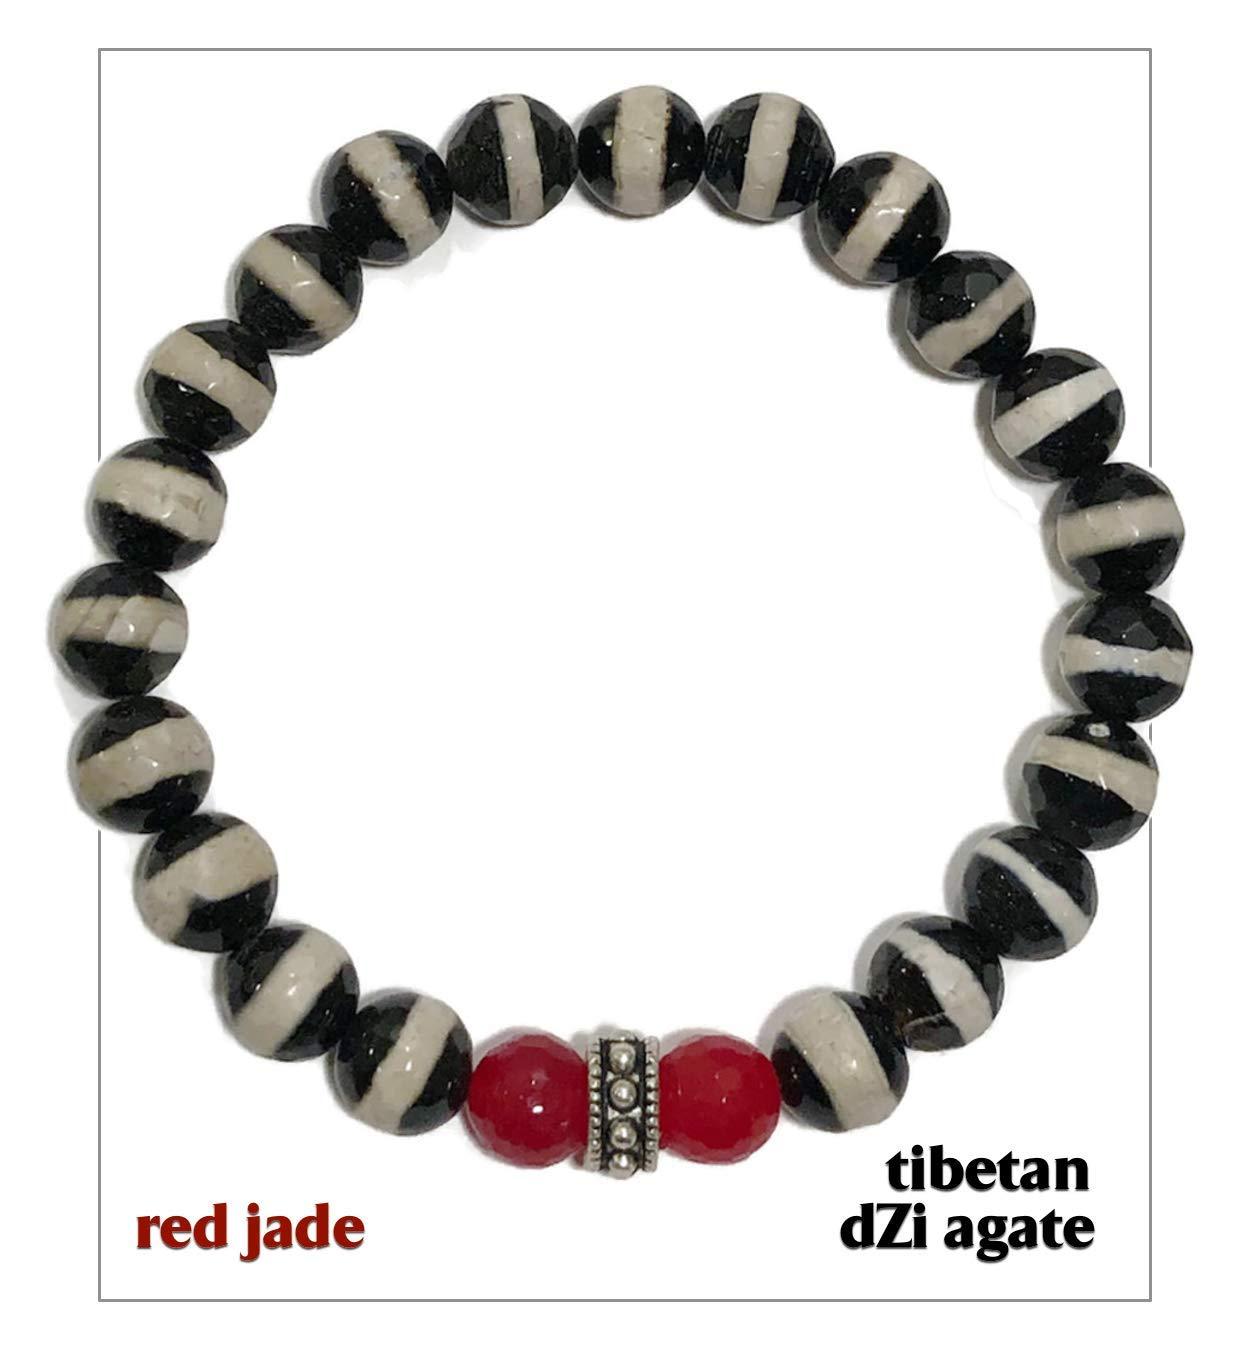 Red Jade Tibetan dZi Agate Chakra Yoga Reiki Healing Energy Zen Meditation Jewelry KarmaArm Good Luck Wellness Self-Care Bracelets Lucky Bracelet